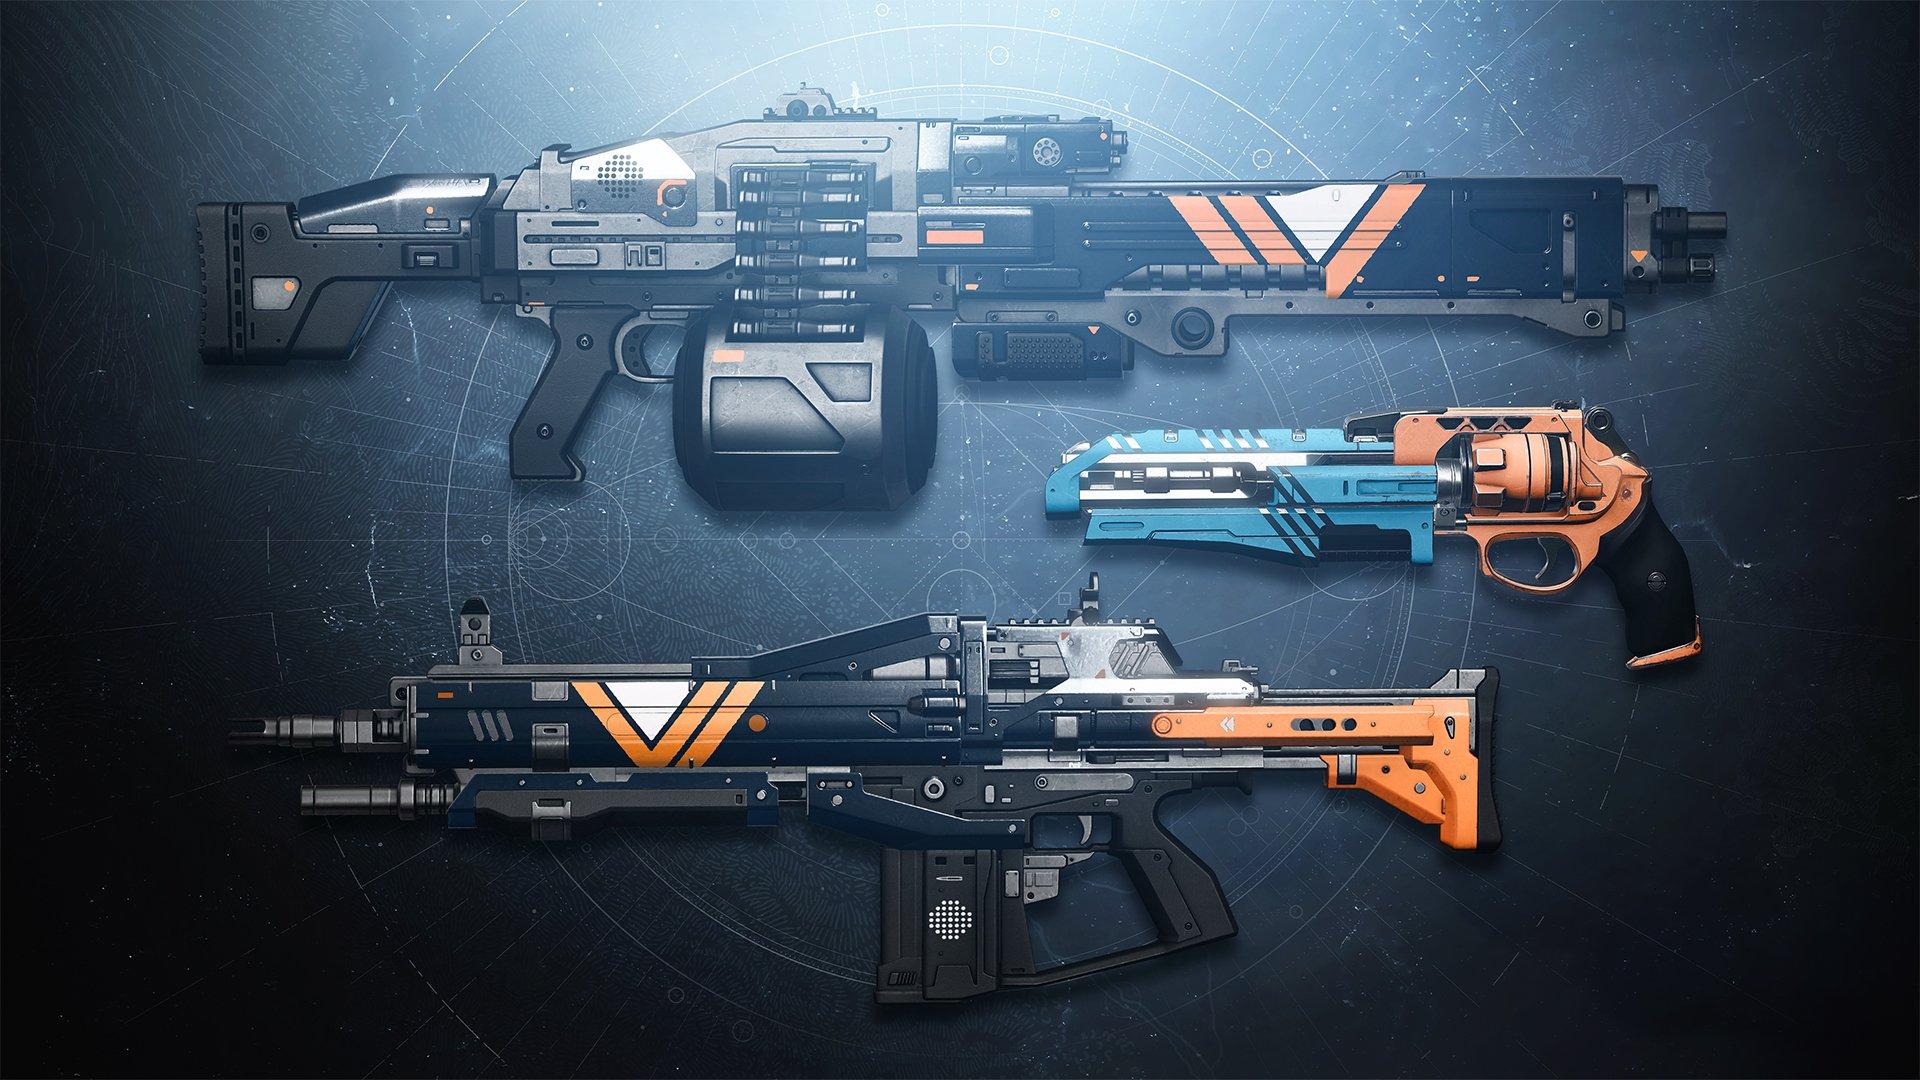 S13_Strike_Weapons-1